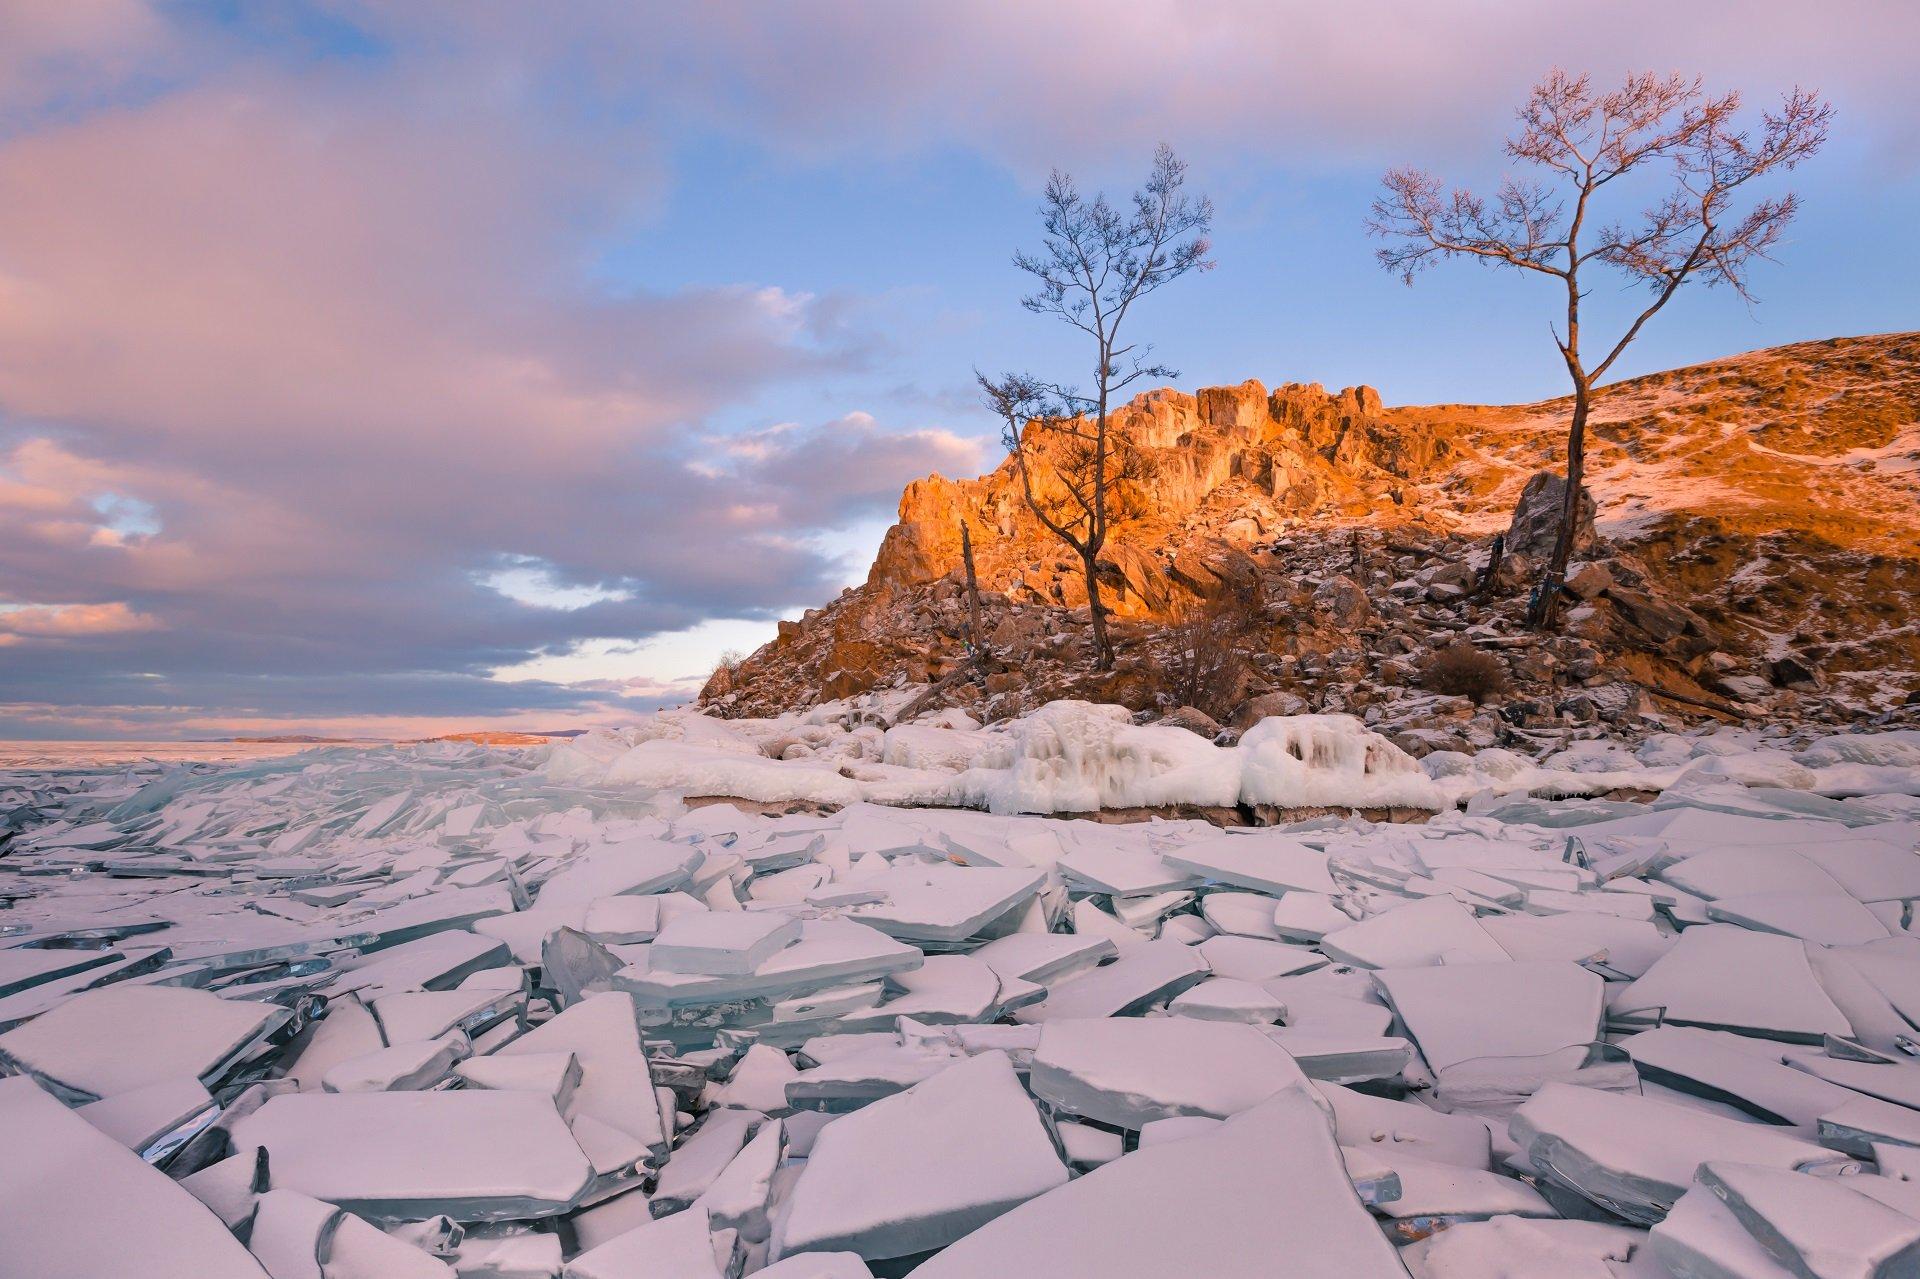 Лед, скалы, закат, Байкал, Ольхон, Малое Море, Виктор Зайцев